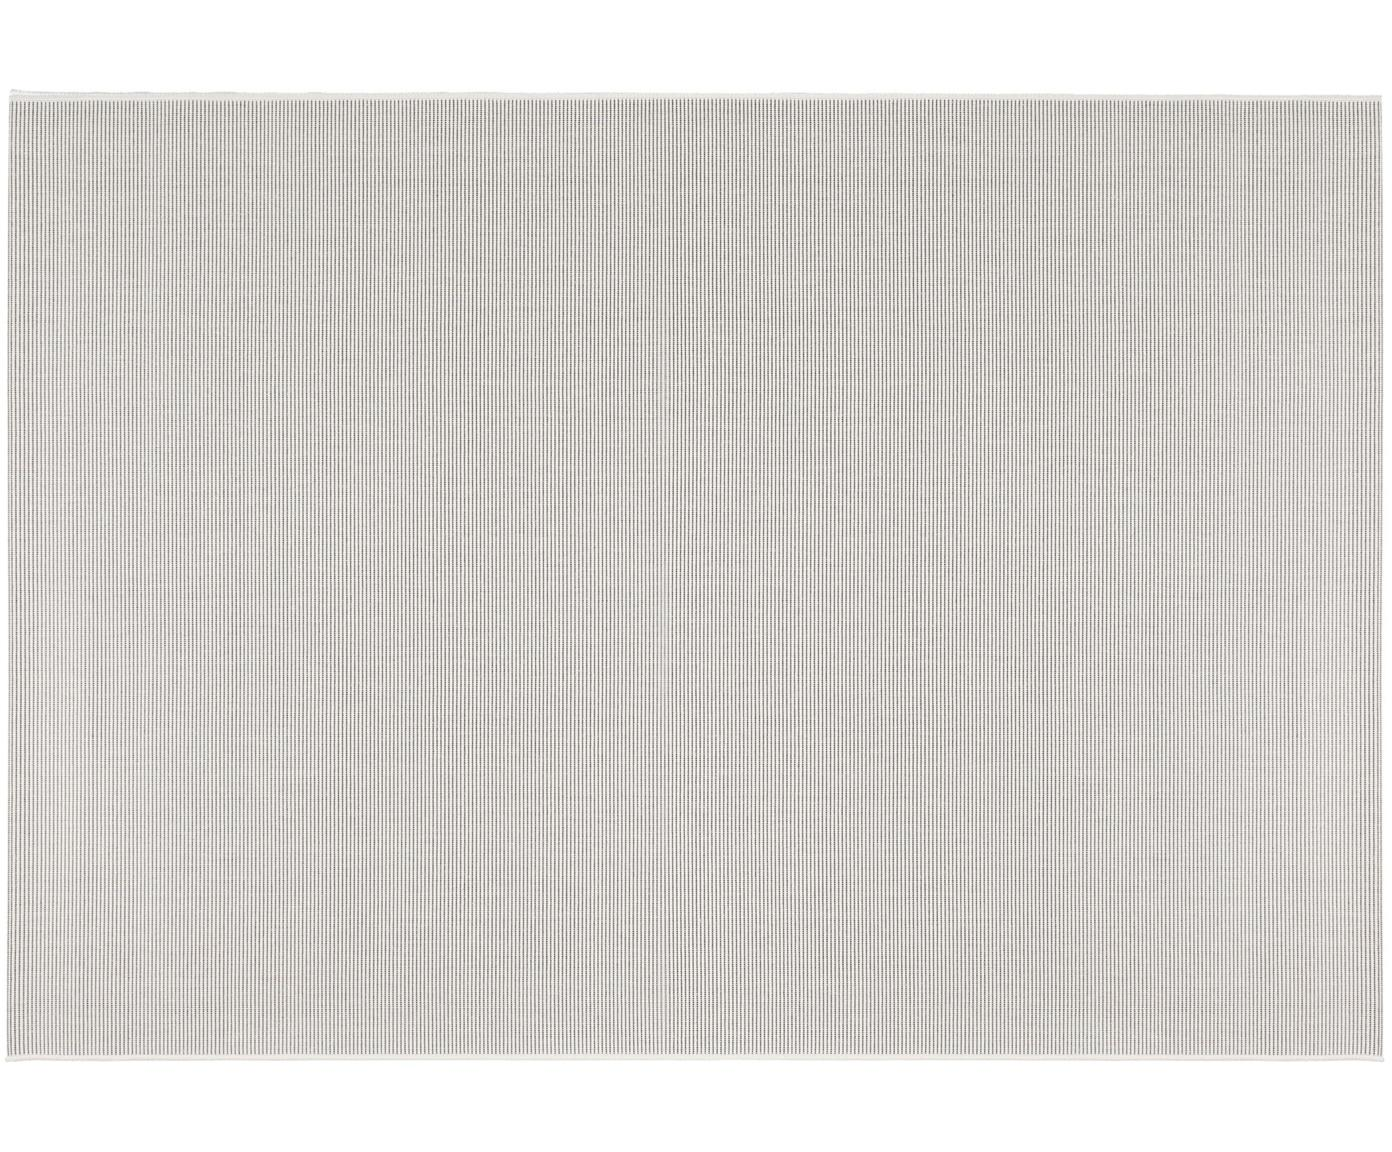 Tappeto da interno-esterno Metro, Polipropilene, Bianco latteo, Larg. 80 x Lung. 150 cm (taglia XS)